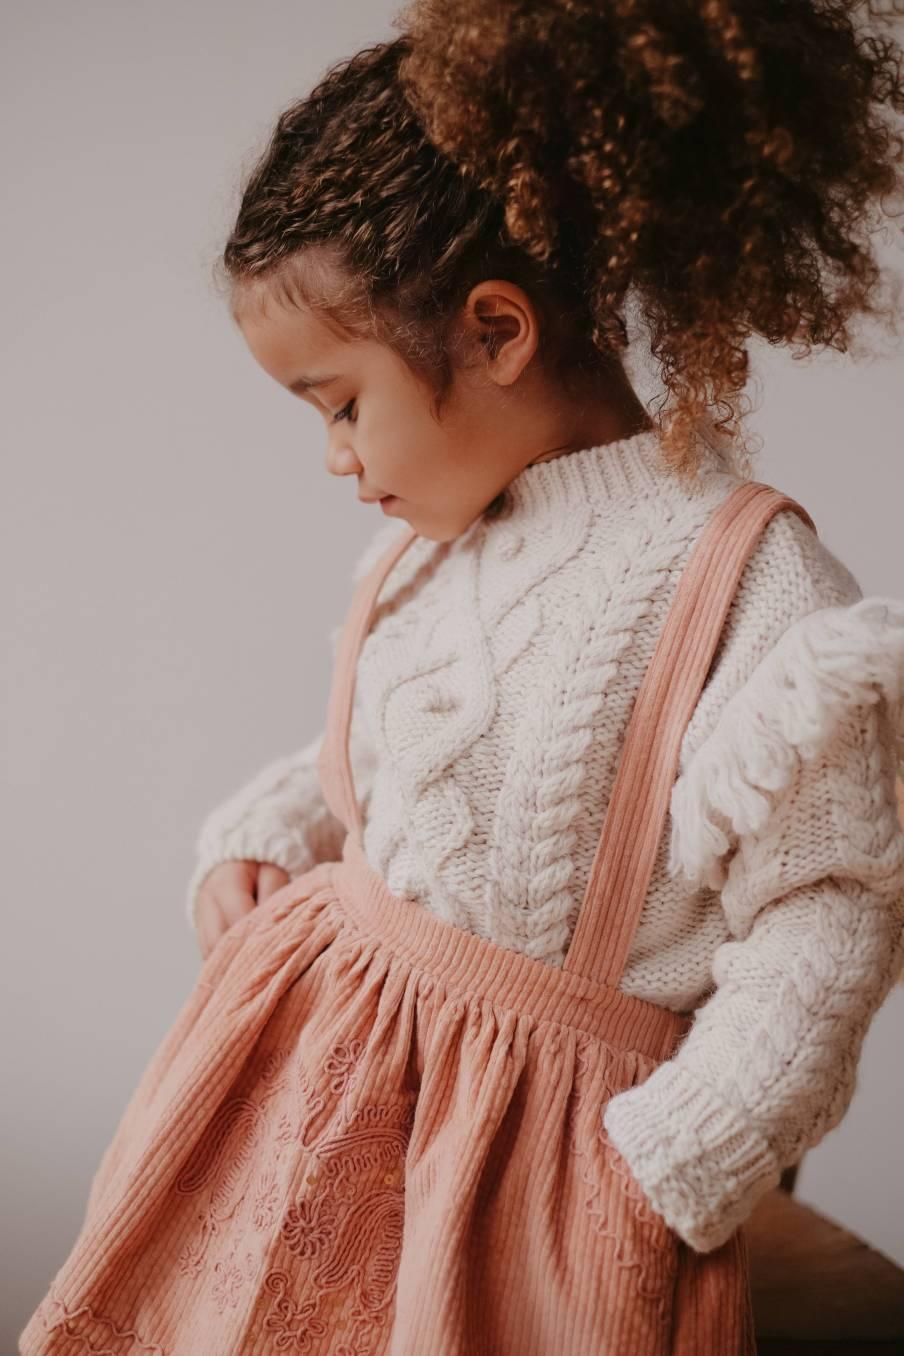 boheme chic vintage jupe bébé fille eleonor sienna velvet